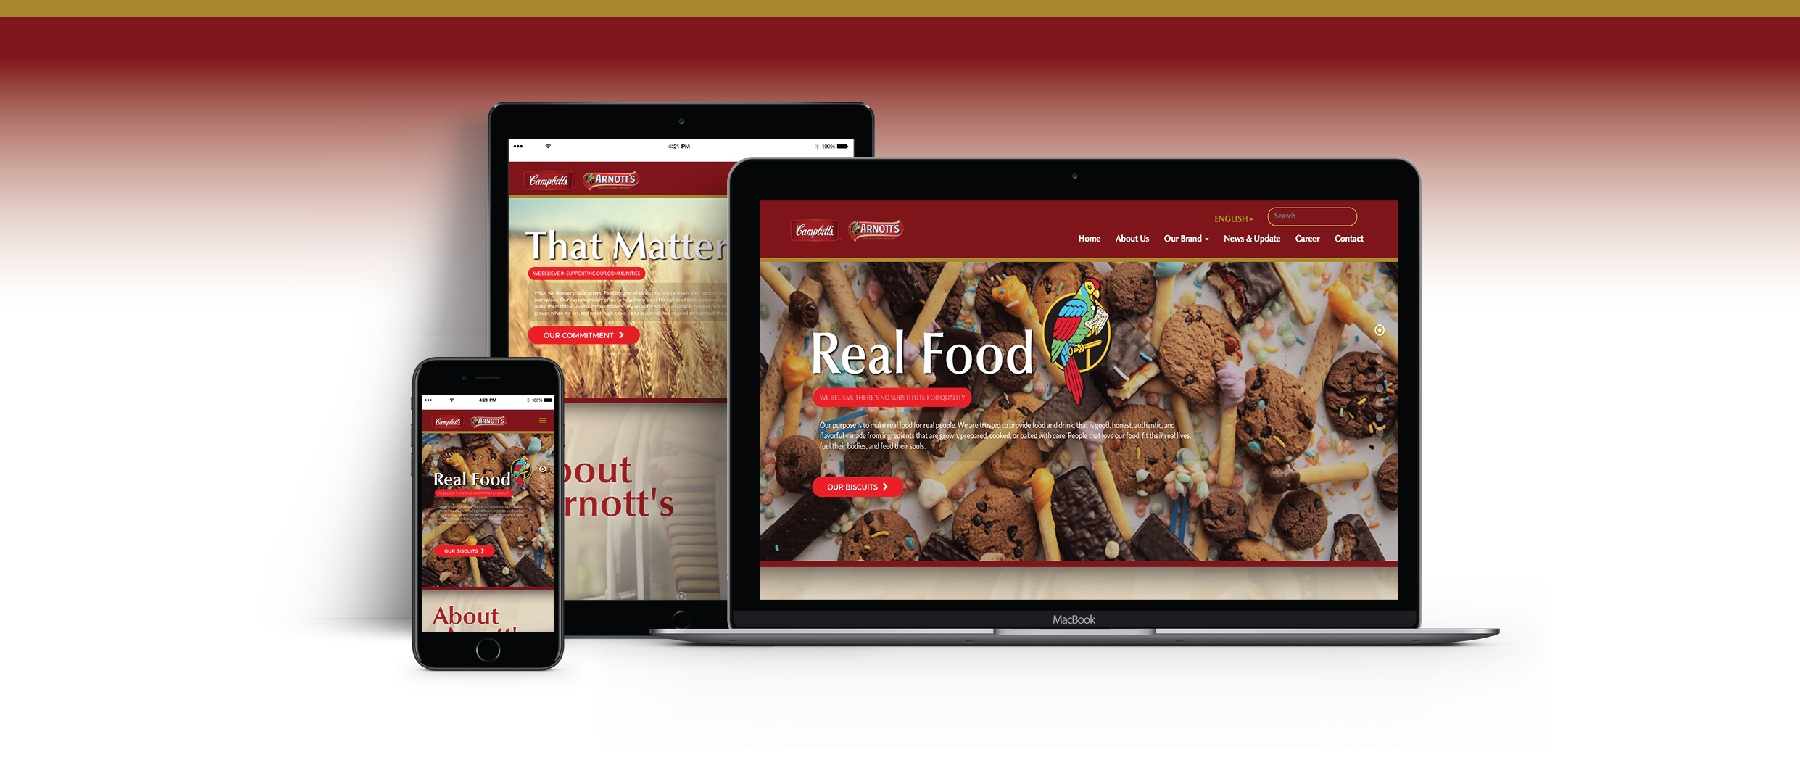 arnotts Website by Grab Essentials